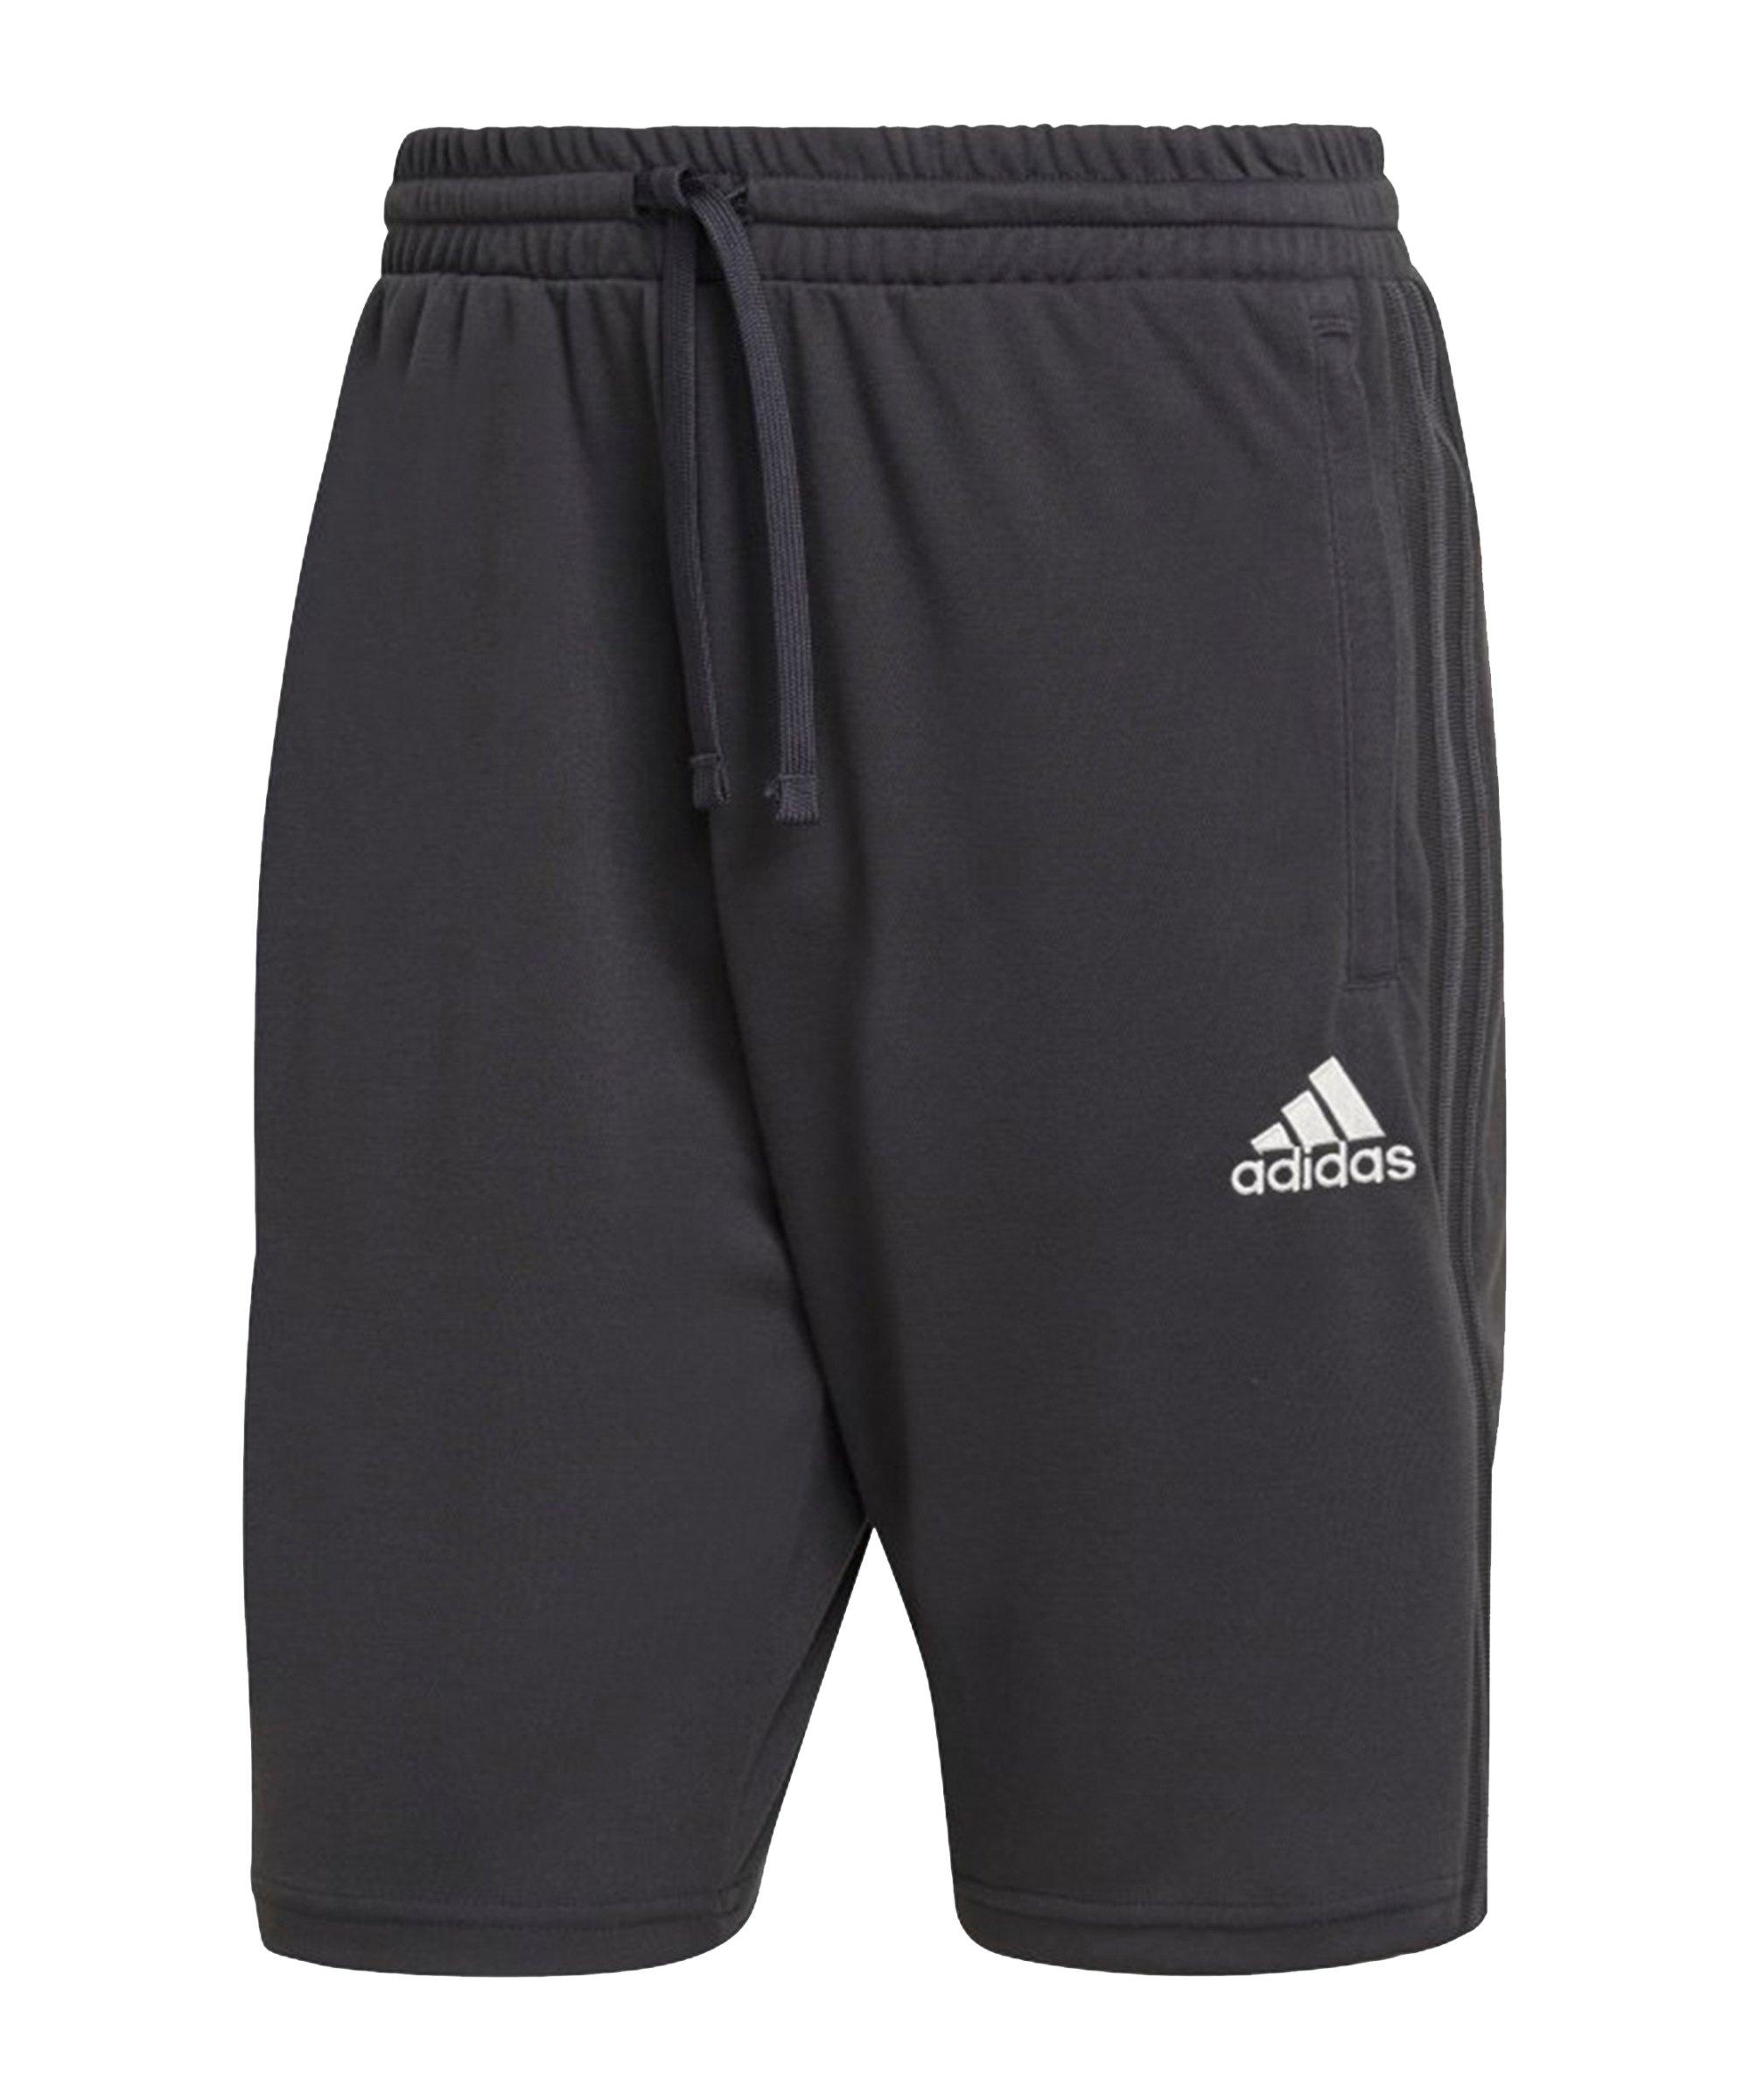 adidas Real Madrid Short Schwarz - schwarz